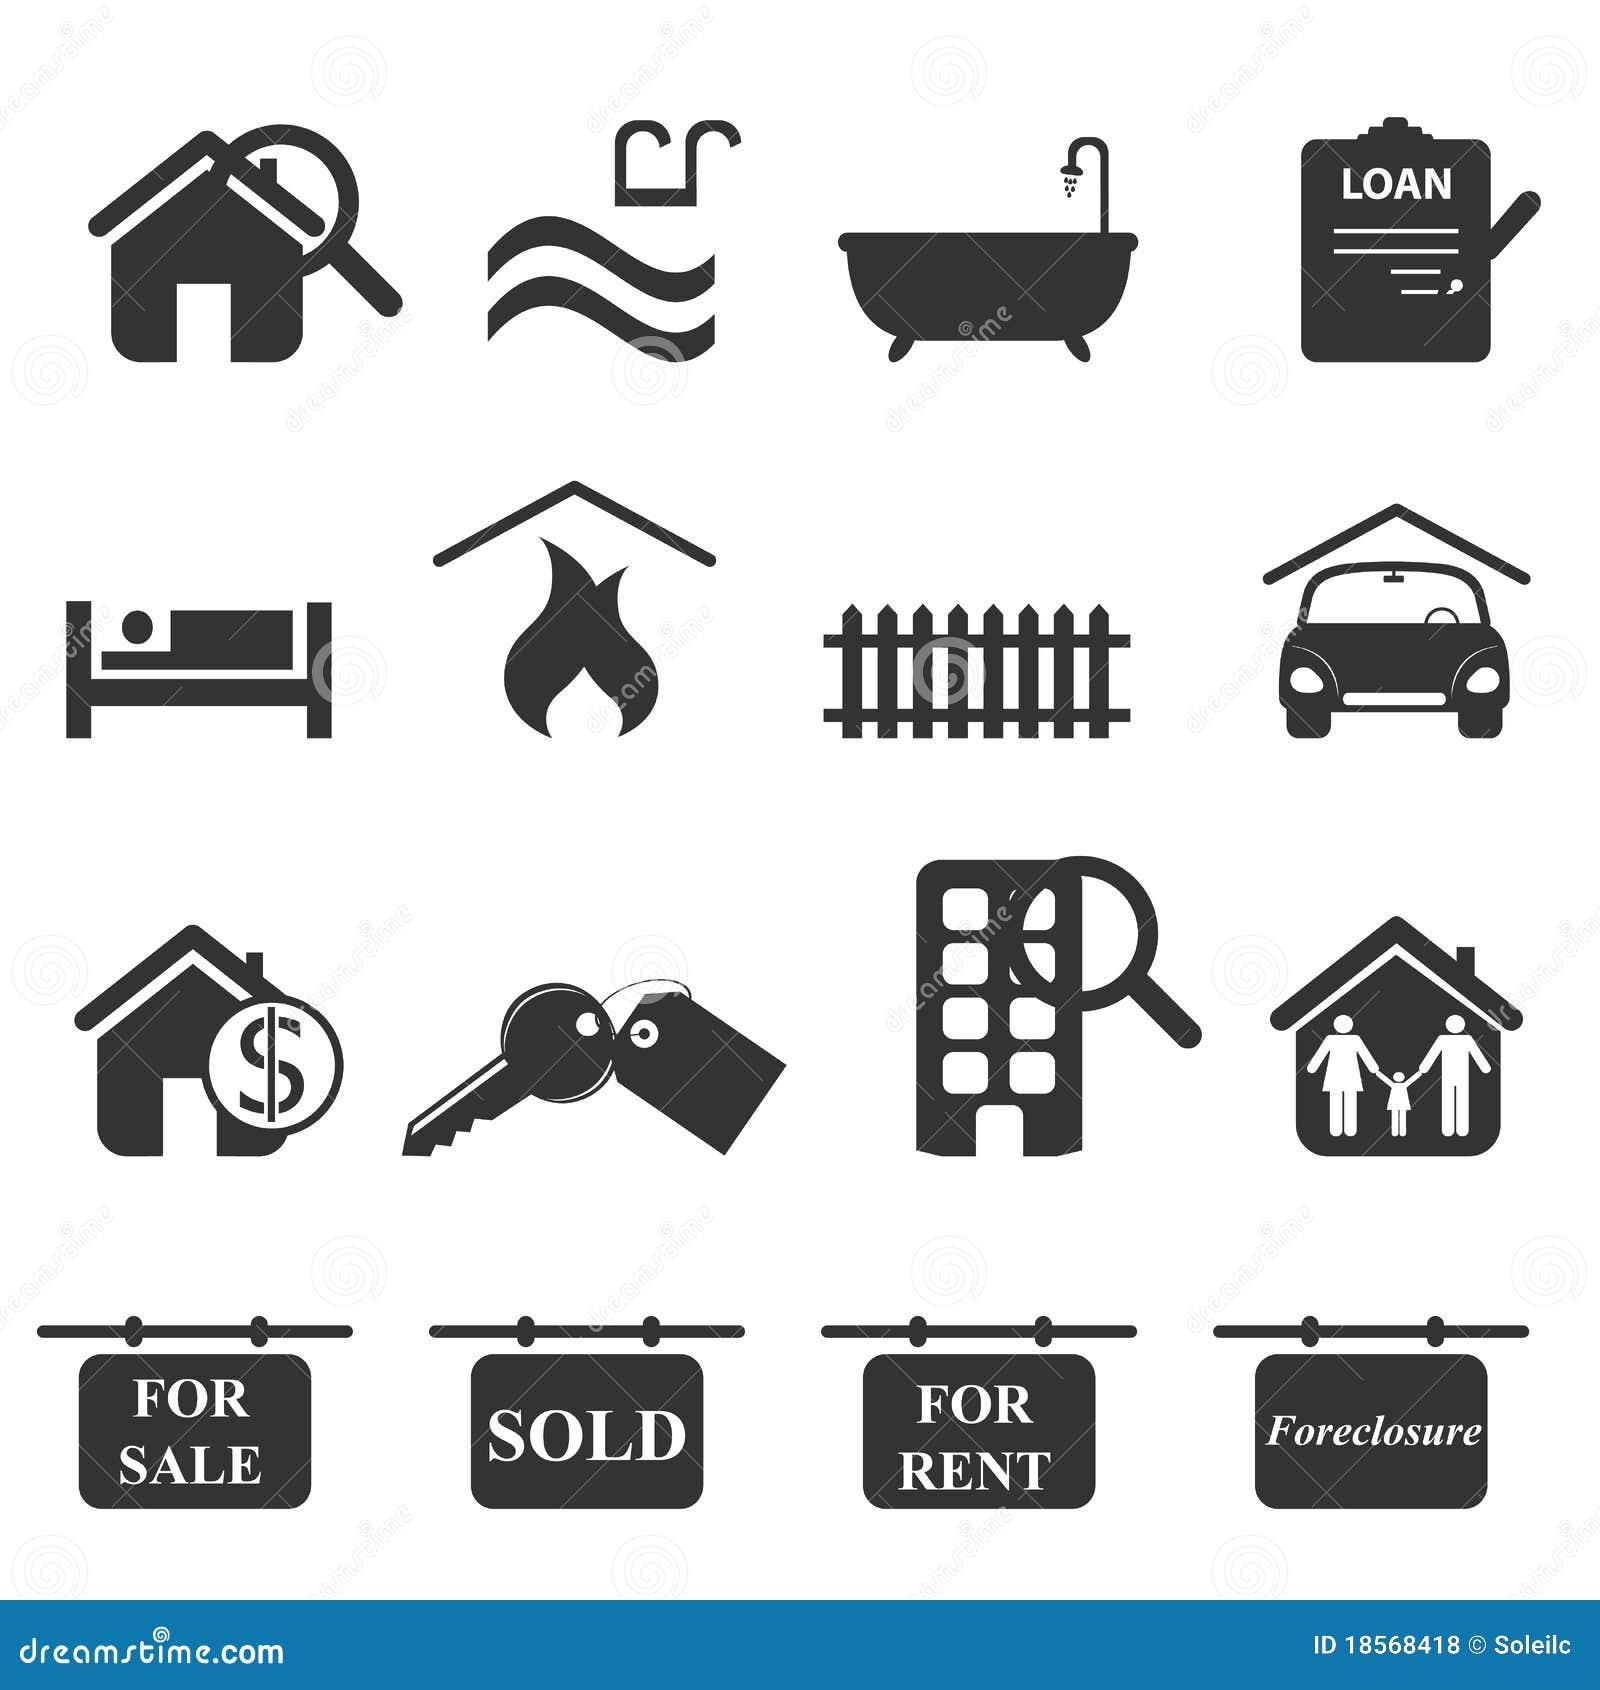 10124 together with Royalty Free Stock Photos Real Estate Symbols Image18568418 besides Casa Tradiciona  lia De 4 Dormitorios Y 1 Planta additionally Bedroom Dimensions And Floor Plans furthermore Escondido Village Lowrise Apartments. on 1 bedroom house plans